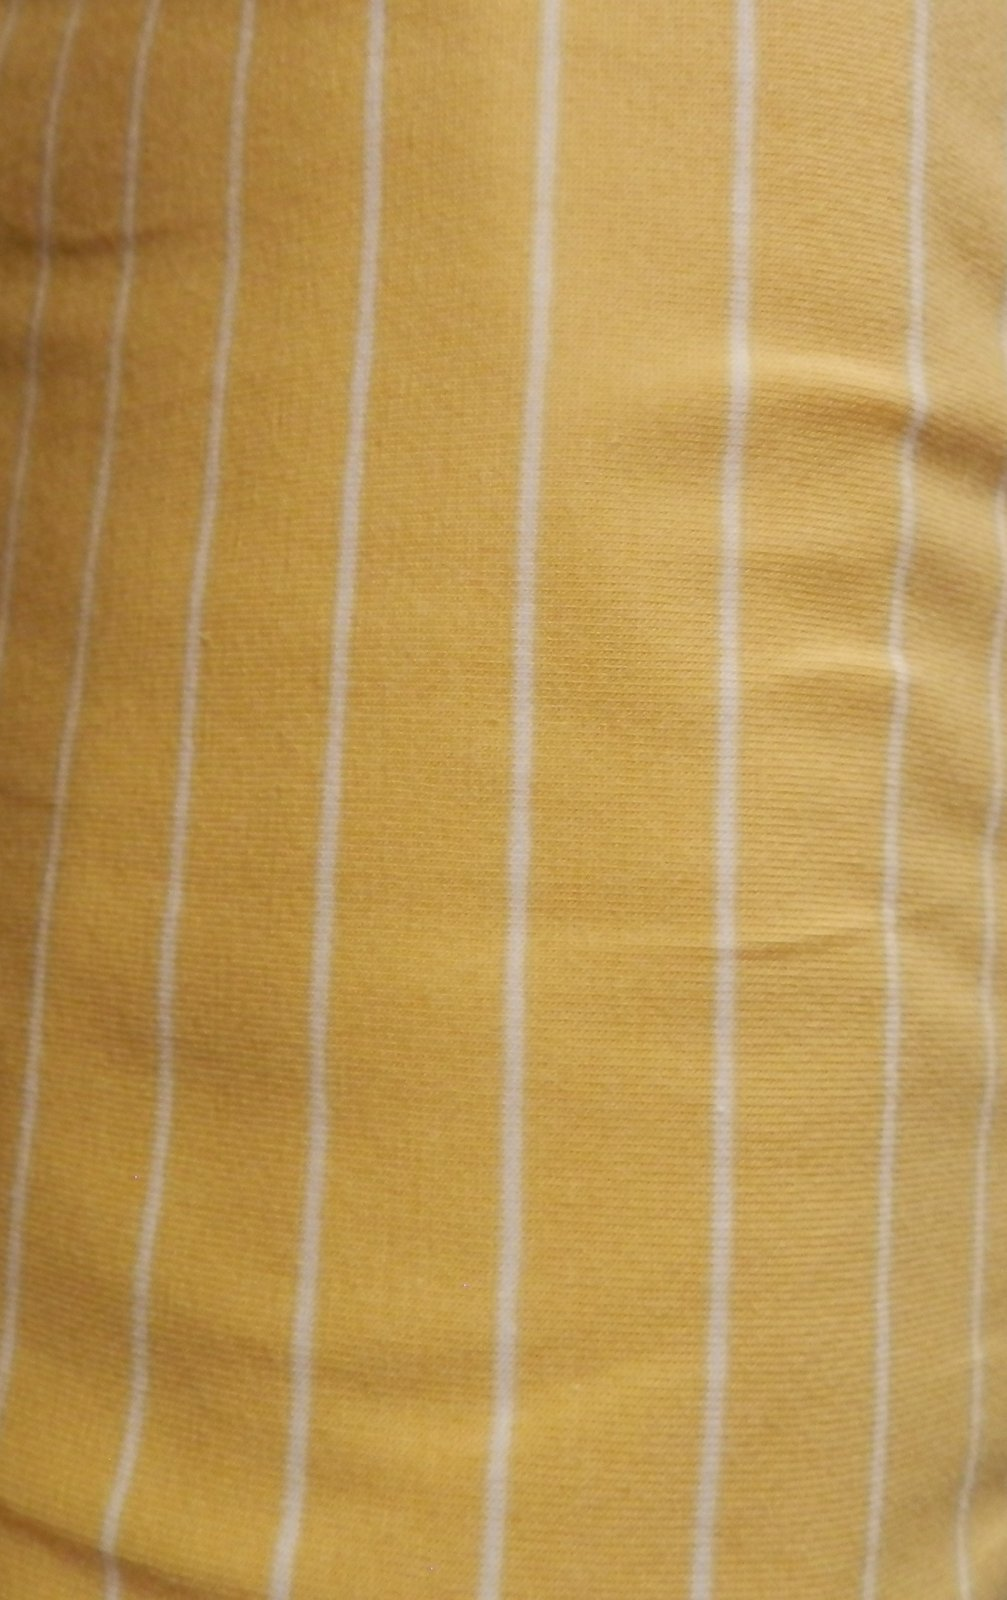 Striped Sleek Sun knit